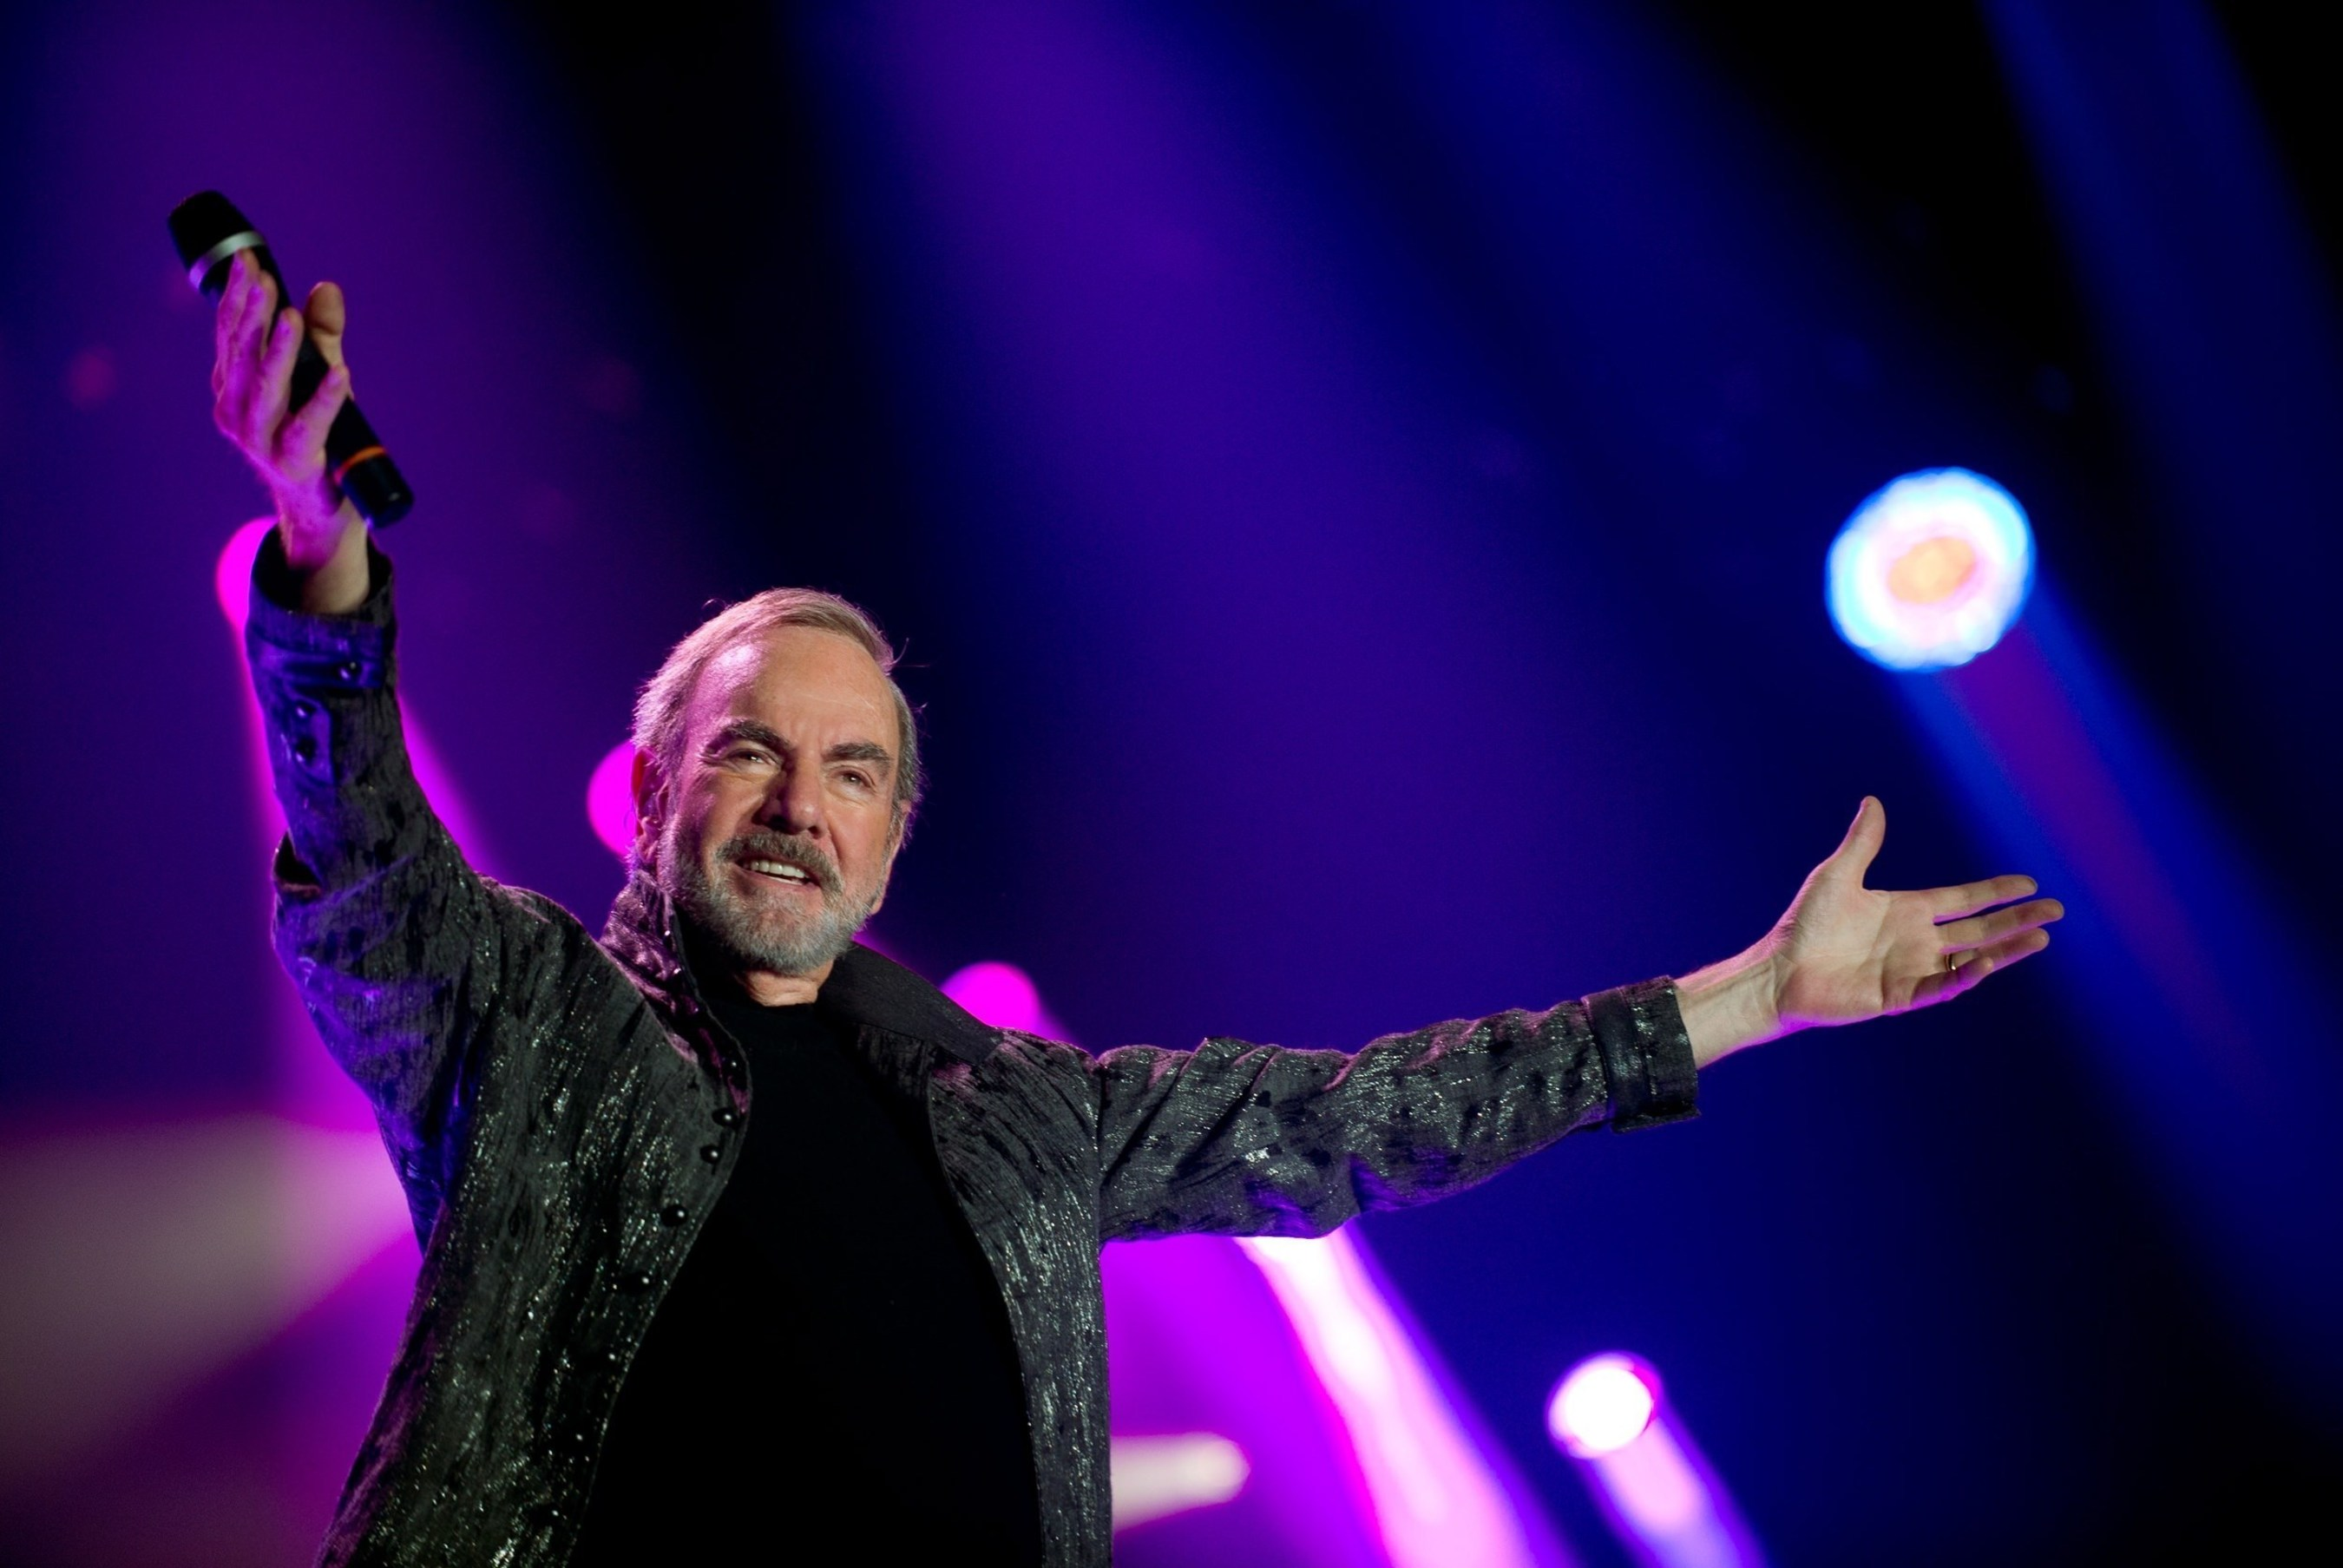 Live Nation Announces Neil Diamond's The 50 Year Anniversary World Tour